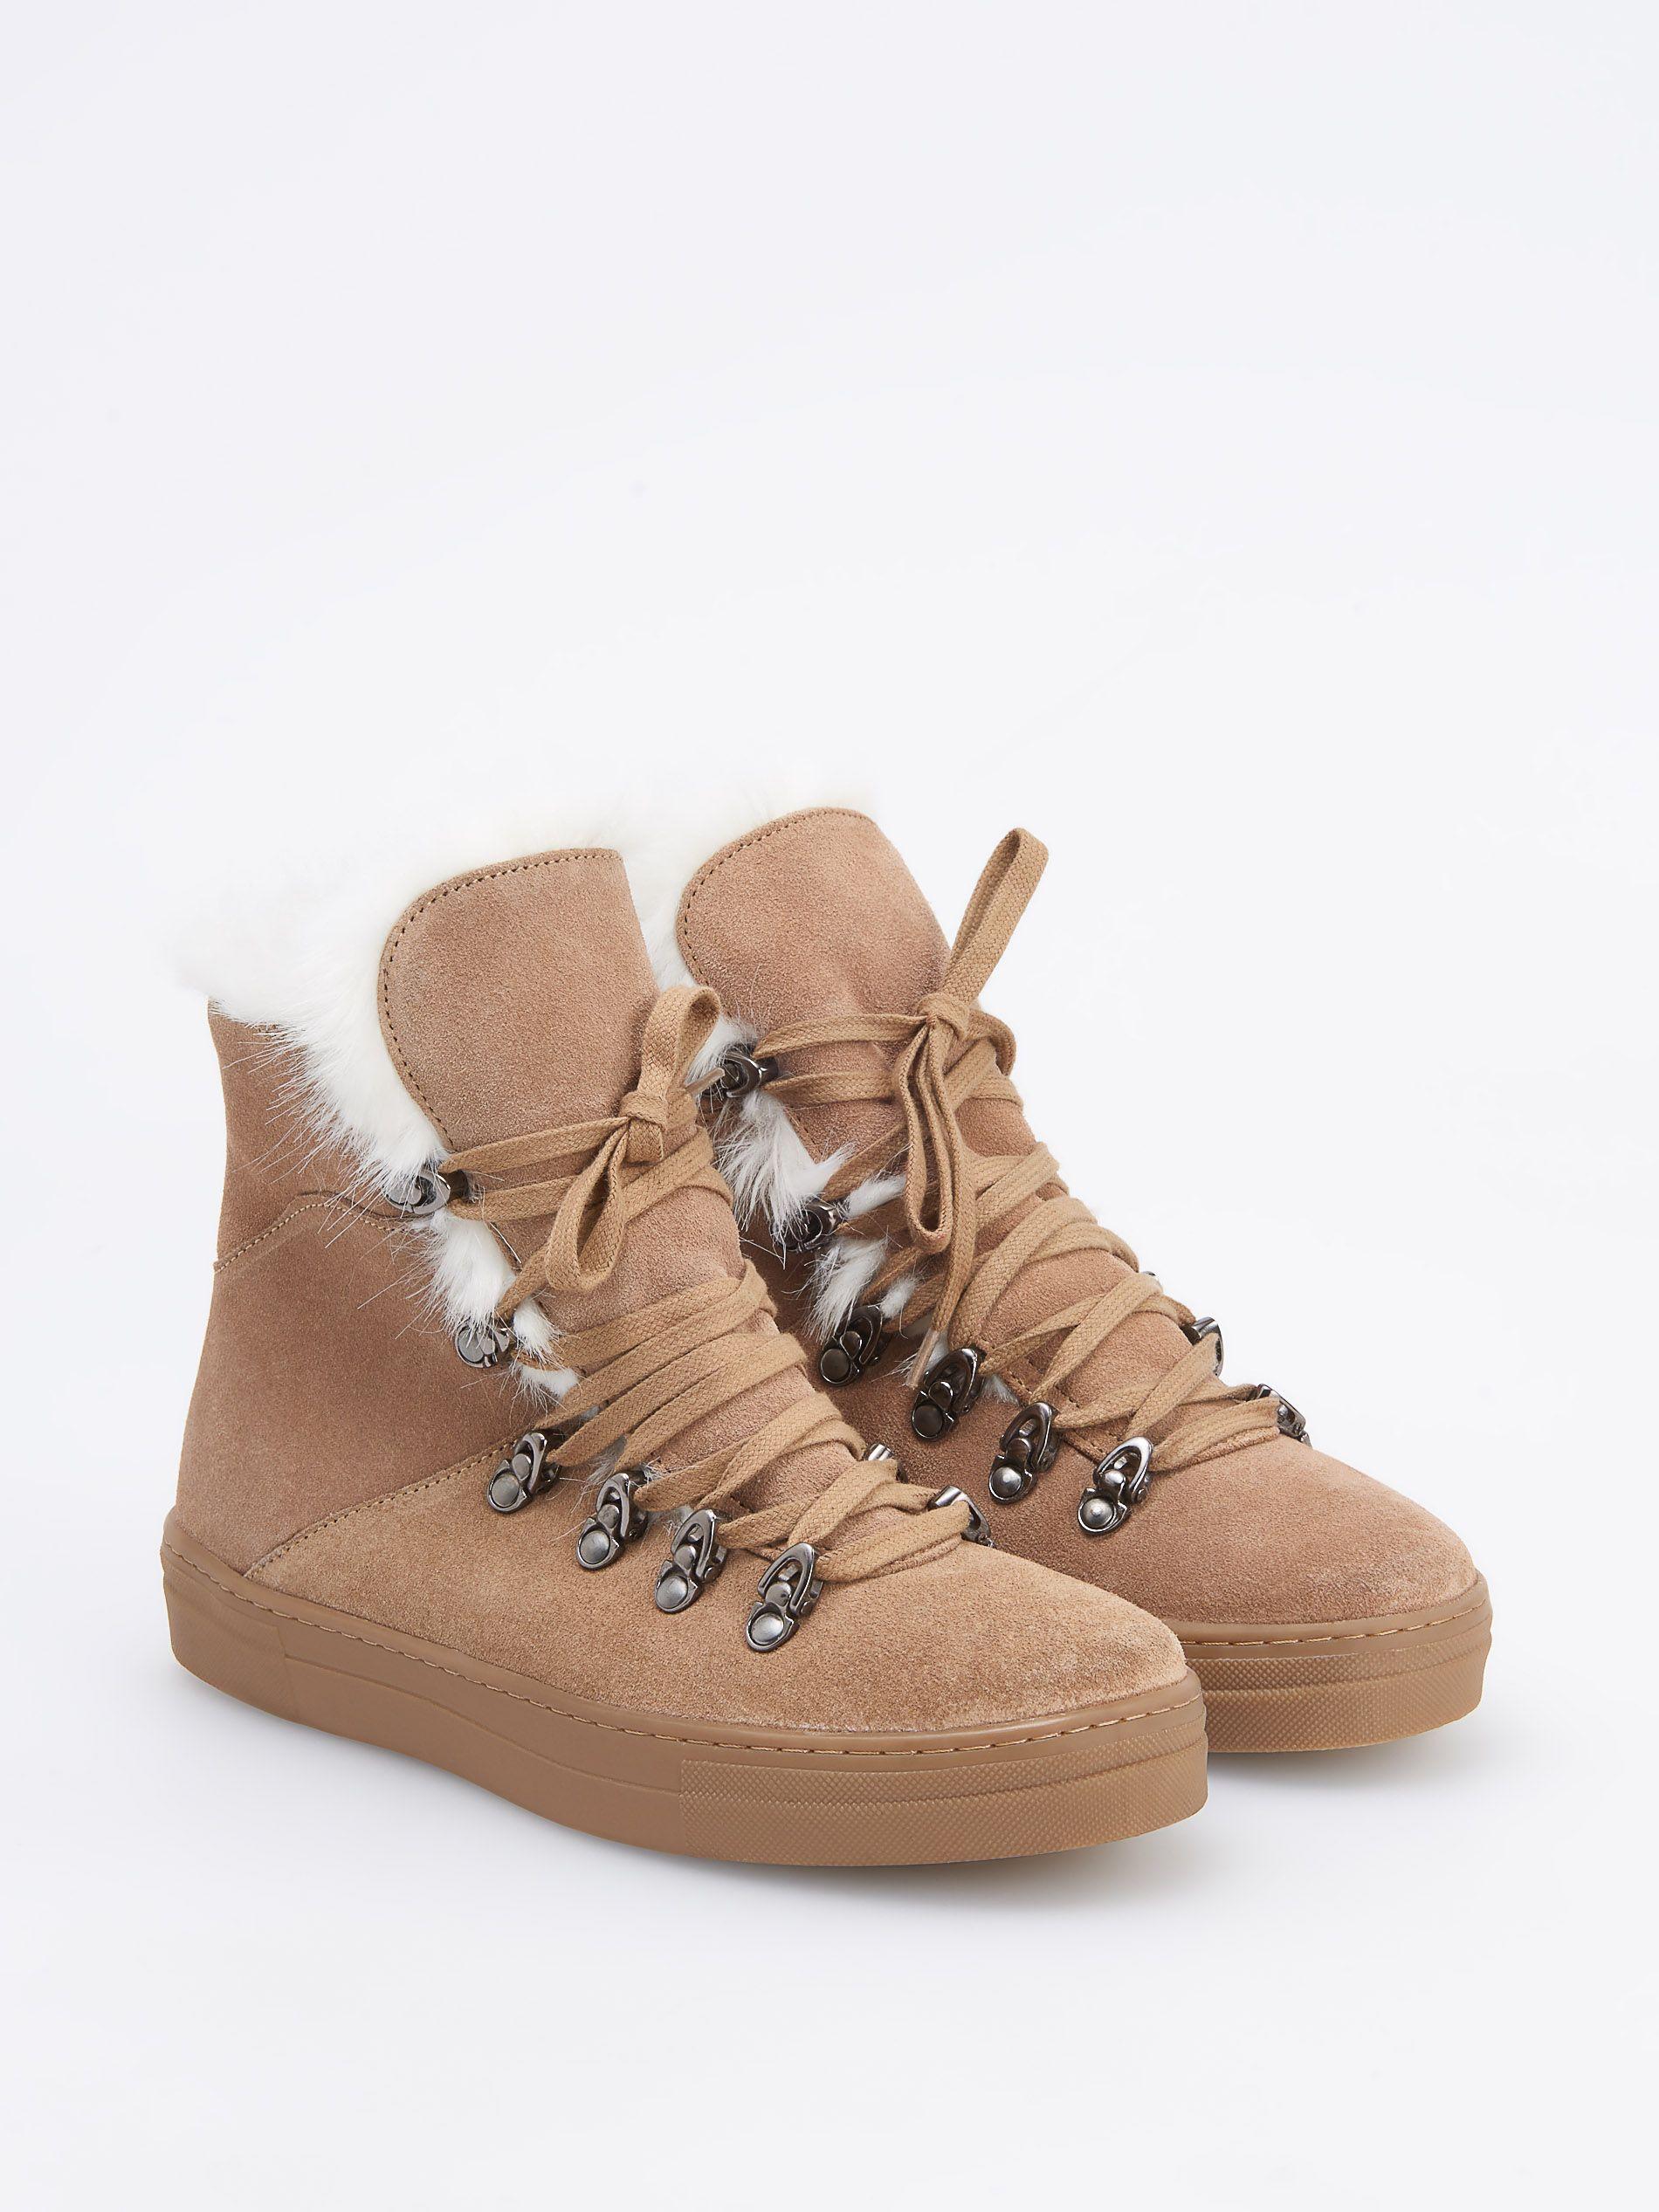 Kalosze Piankowe Ocieplane Ze Sciagaczem Eva Demar Farmer S Boots Rain Boots Shoes